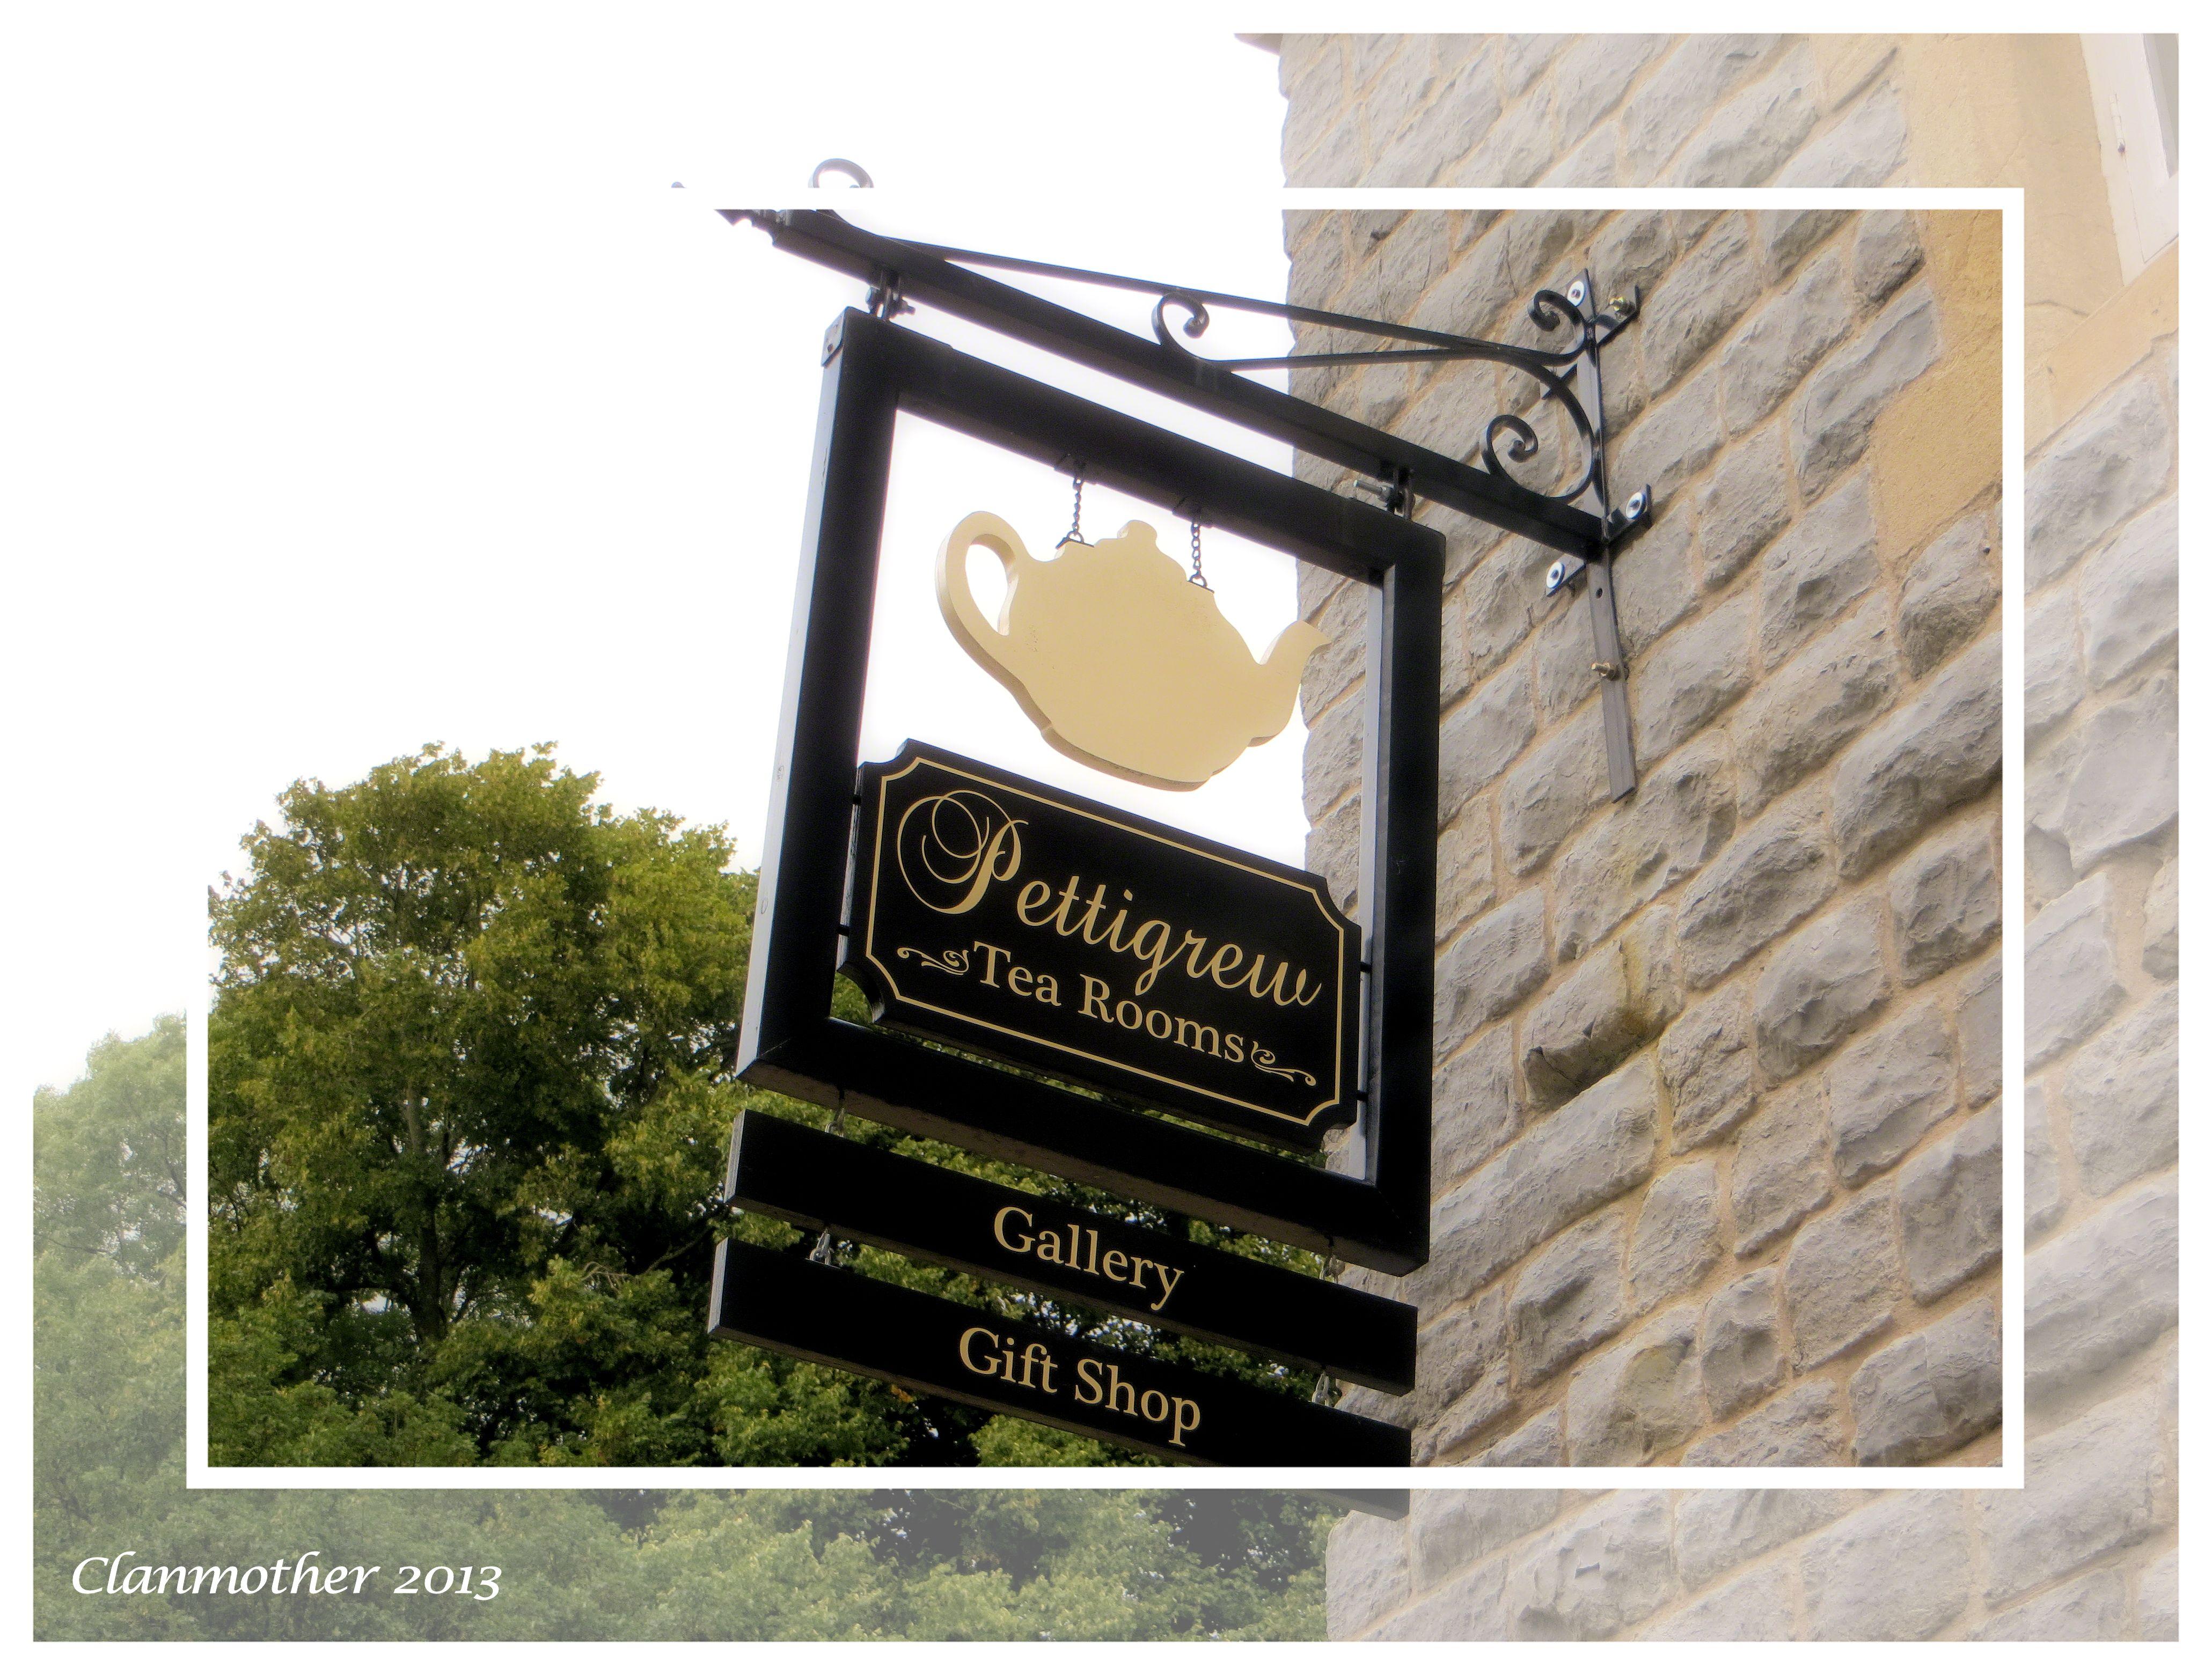 Pettigrew Tea Rooms Opening Hours